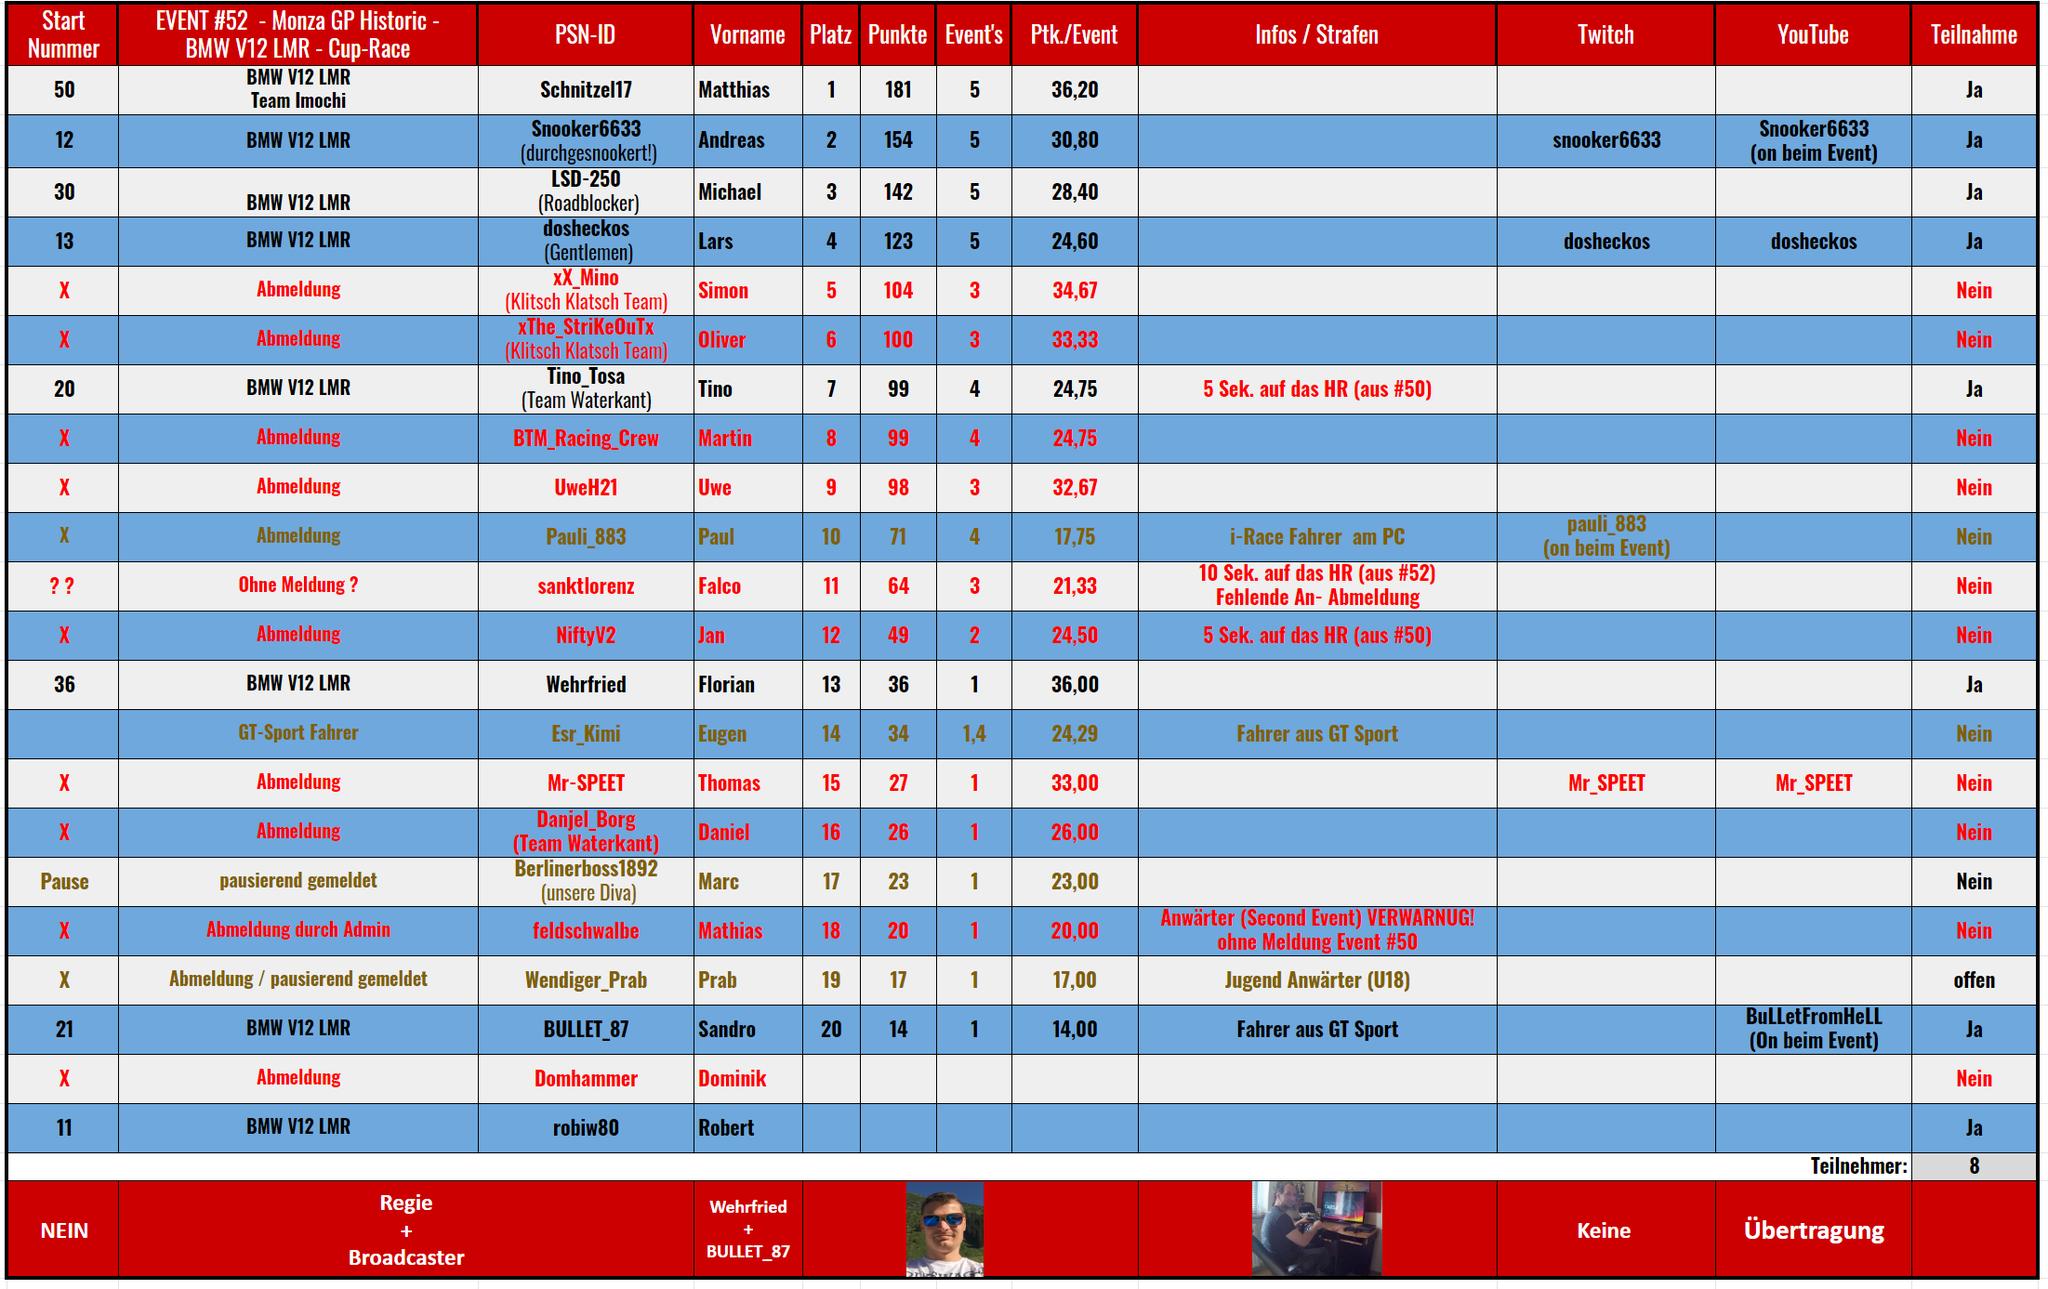 052 - BMW V12 LMR - Nazionale Monza GP Historic (24.01.2021) rollierende Rangliste